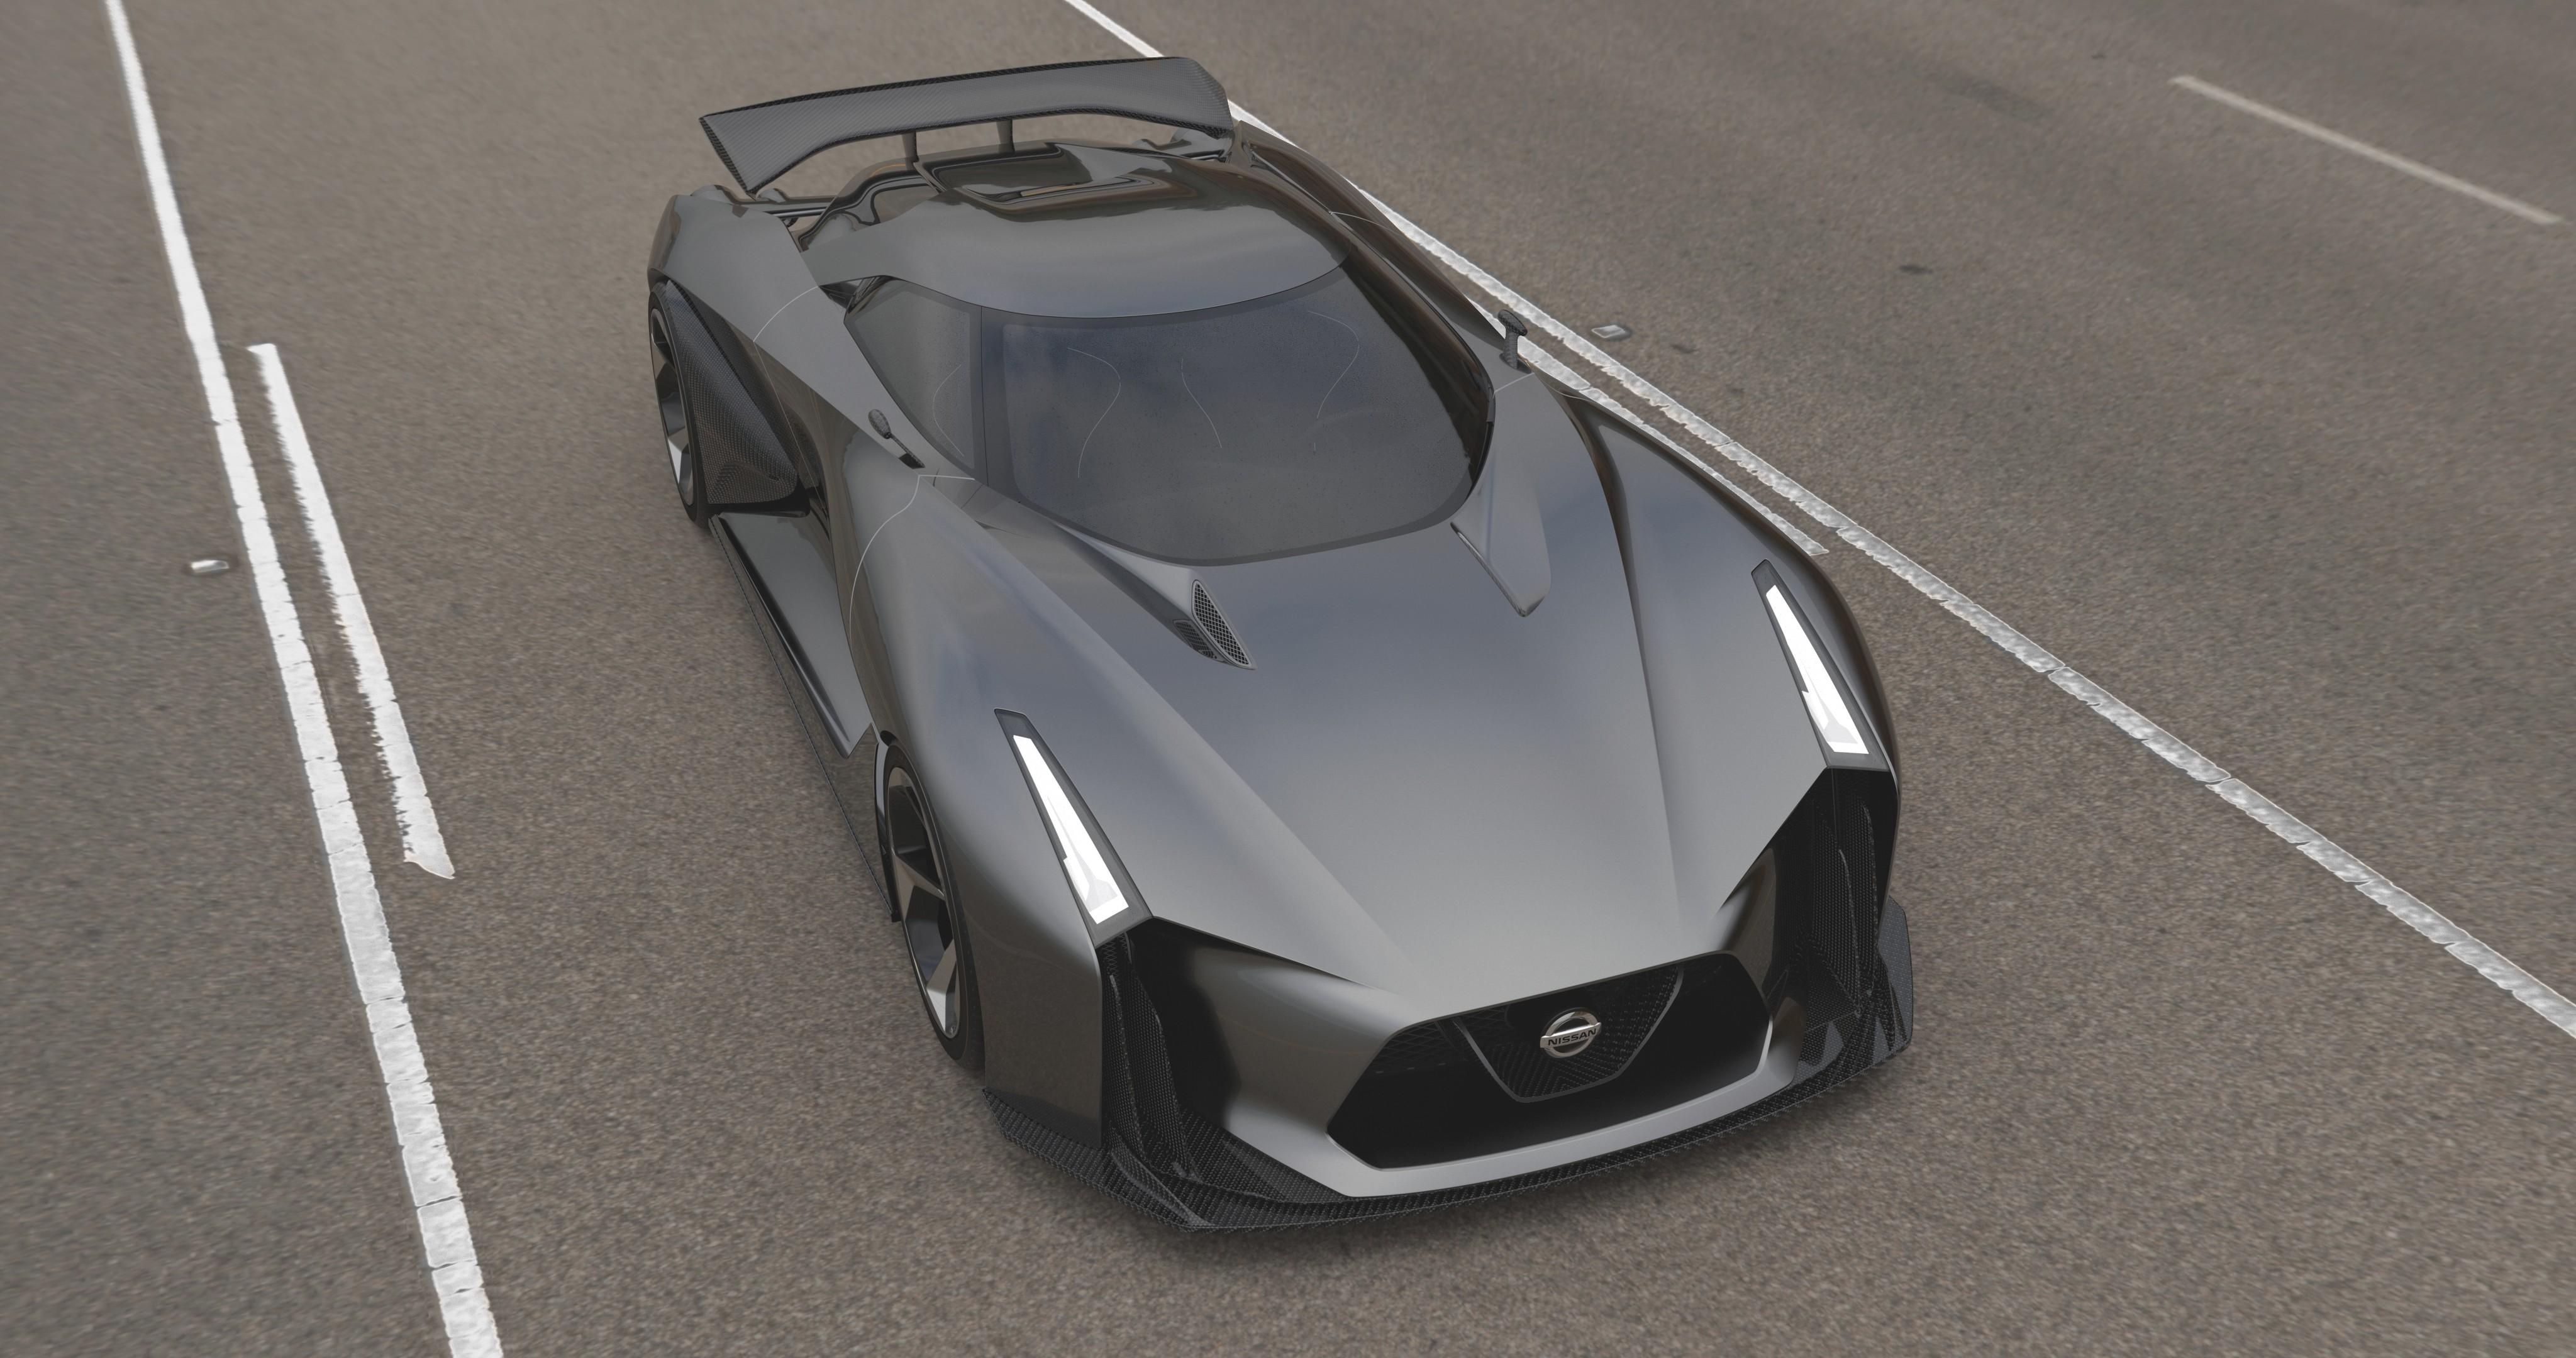 nissan-concept-2020-vision-gran-turismo-sony-playstation-0-100_3